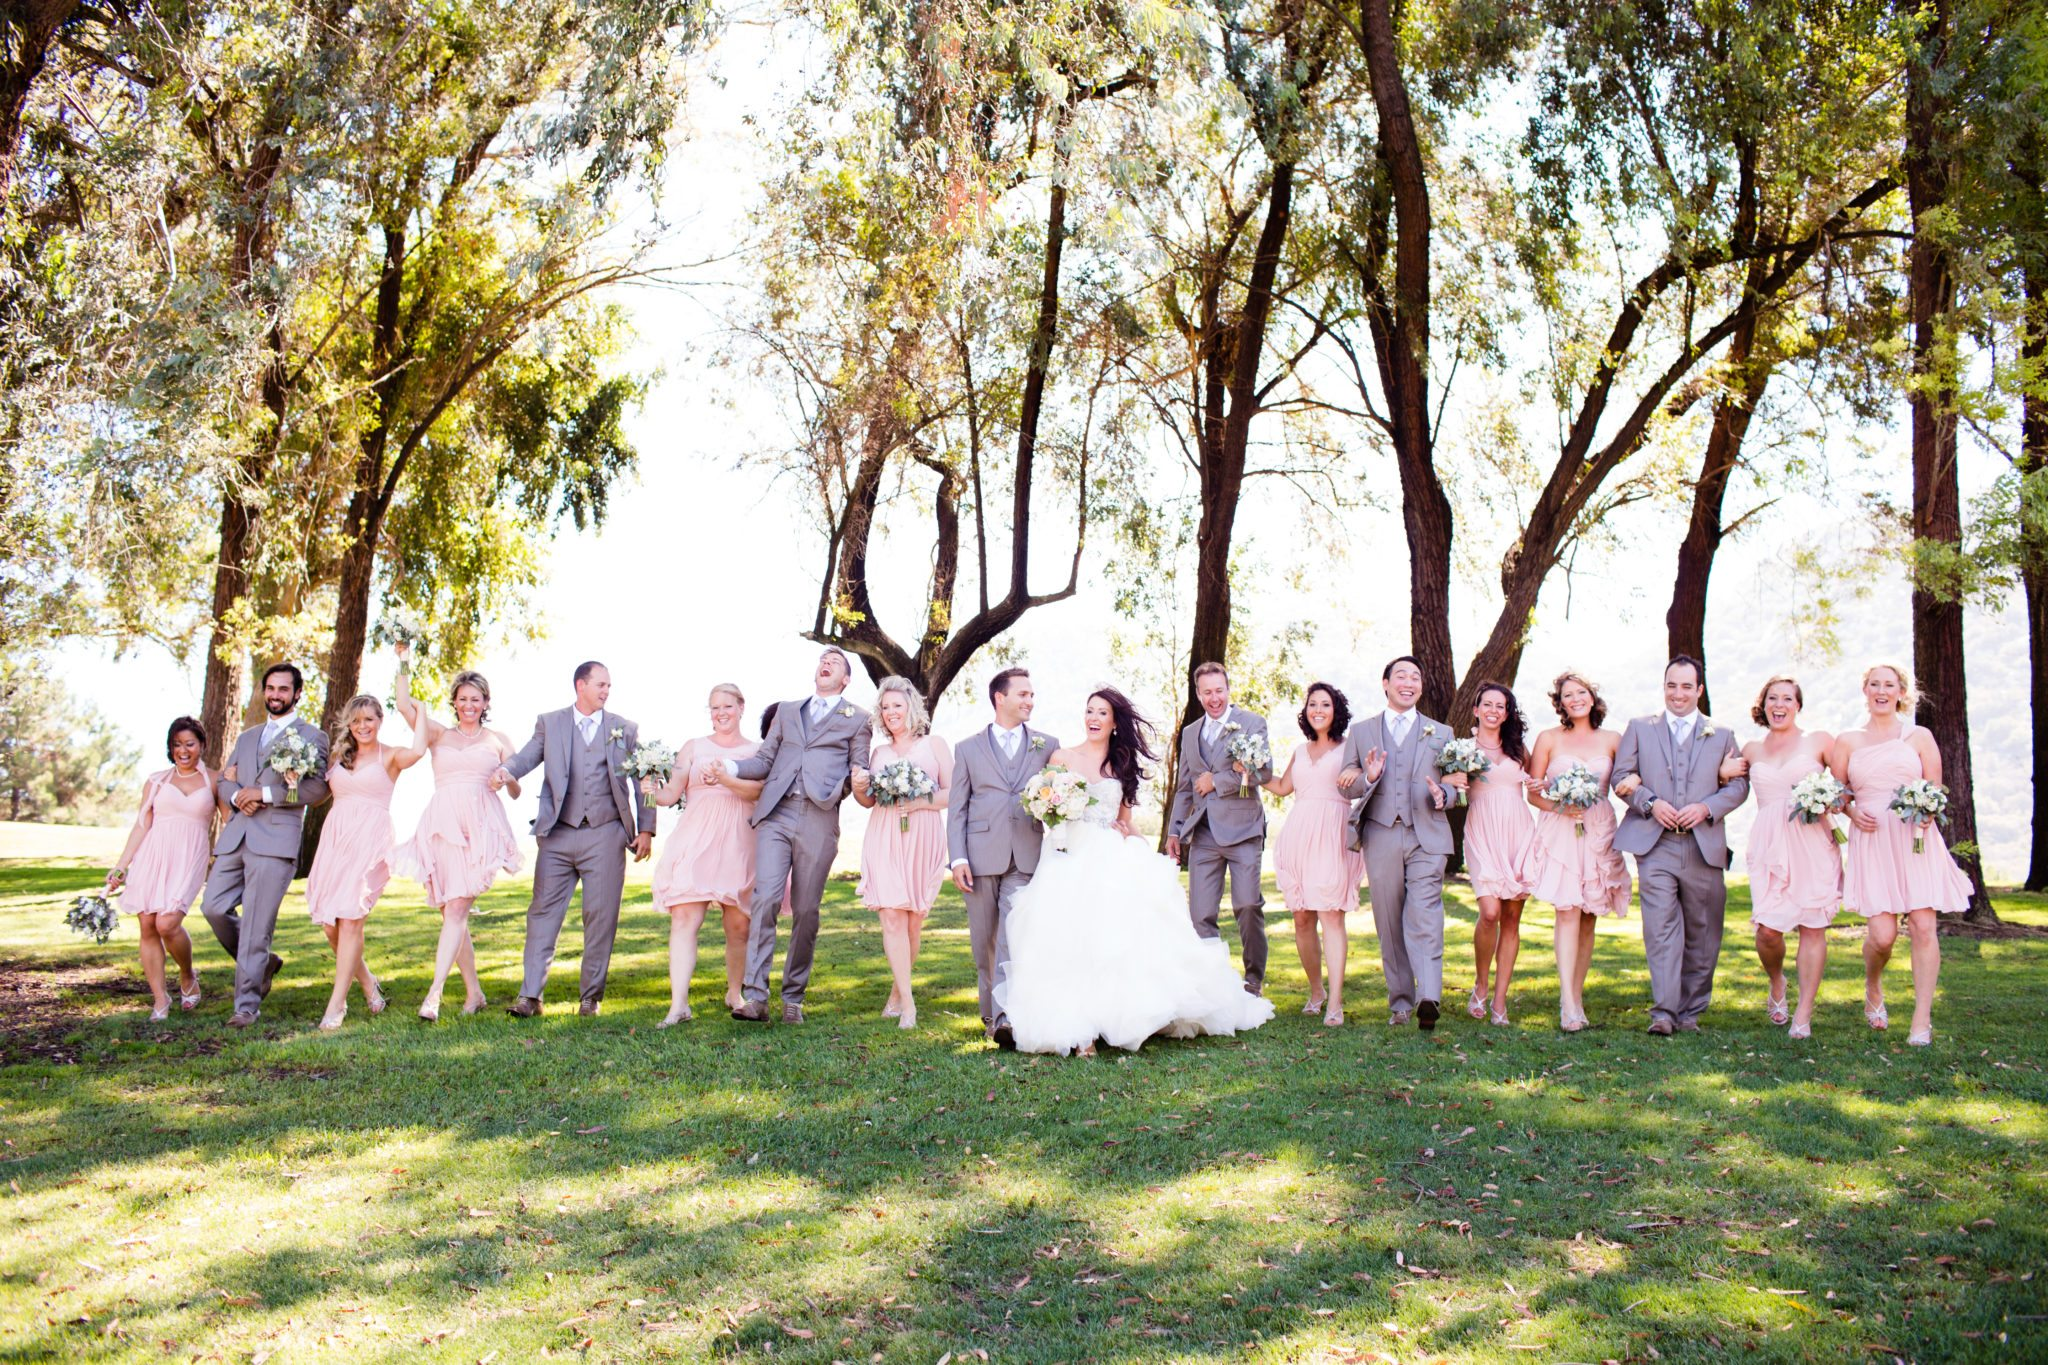 Temecula_Creek_Inn_Wedding_039.jpg